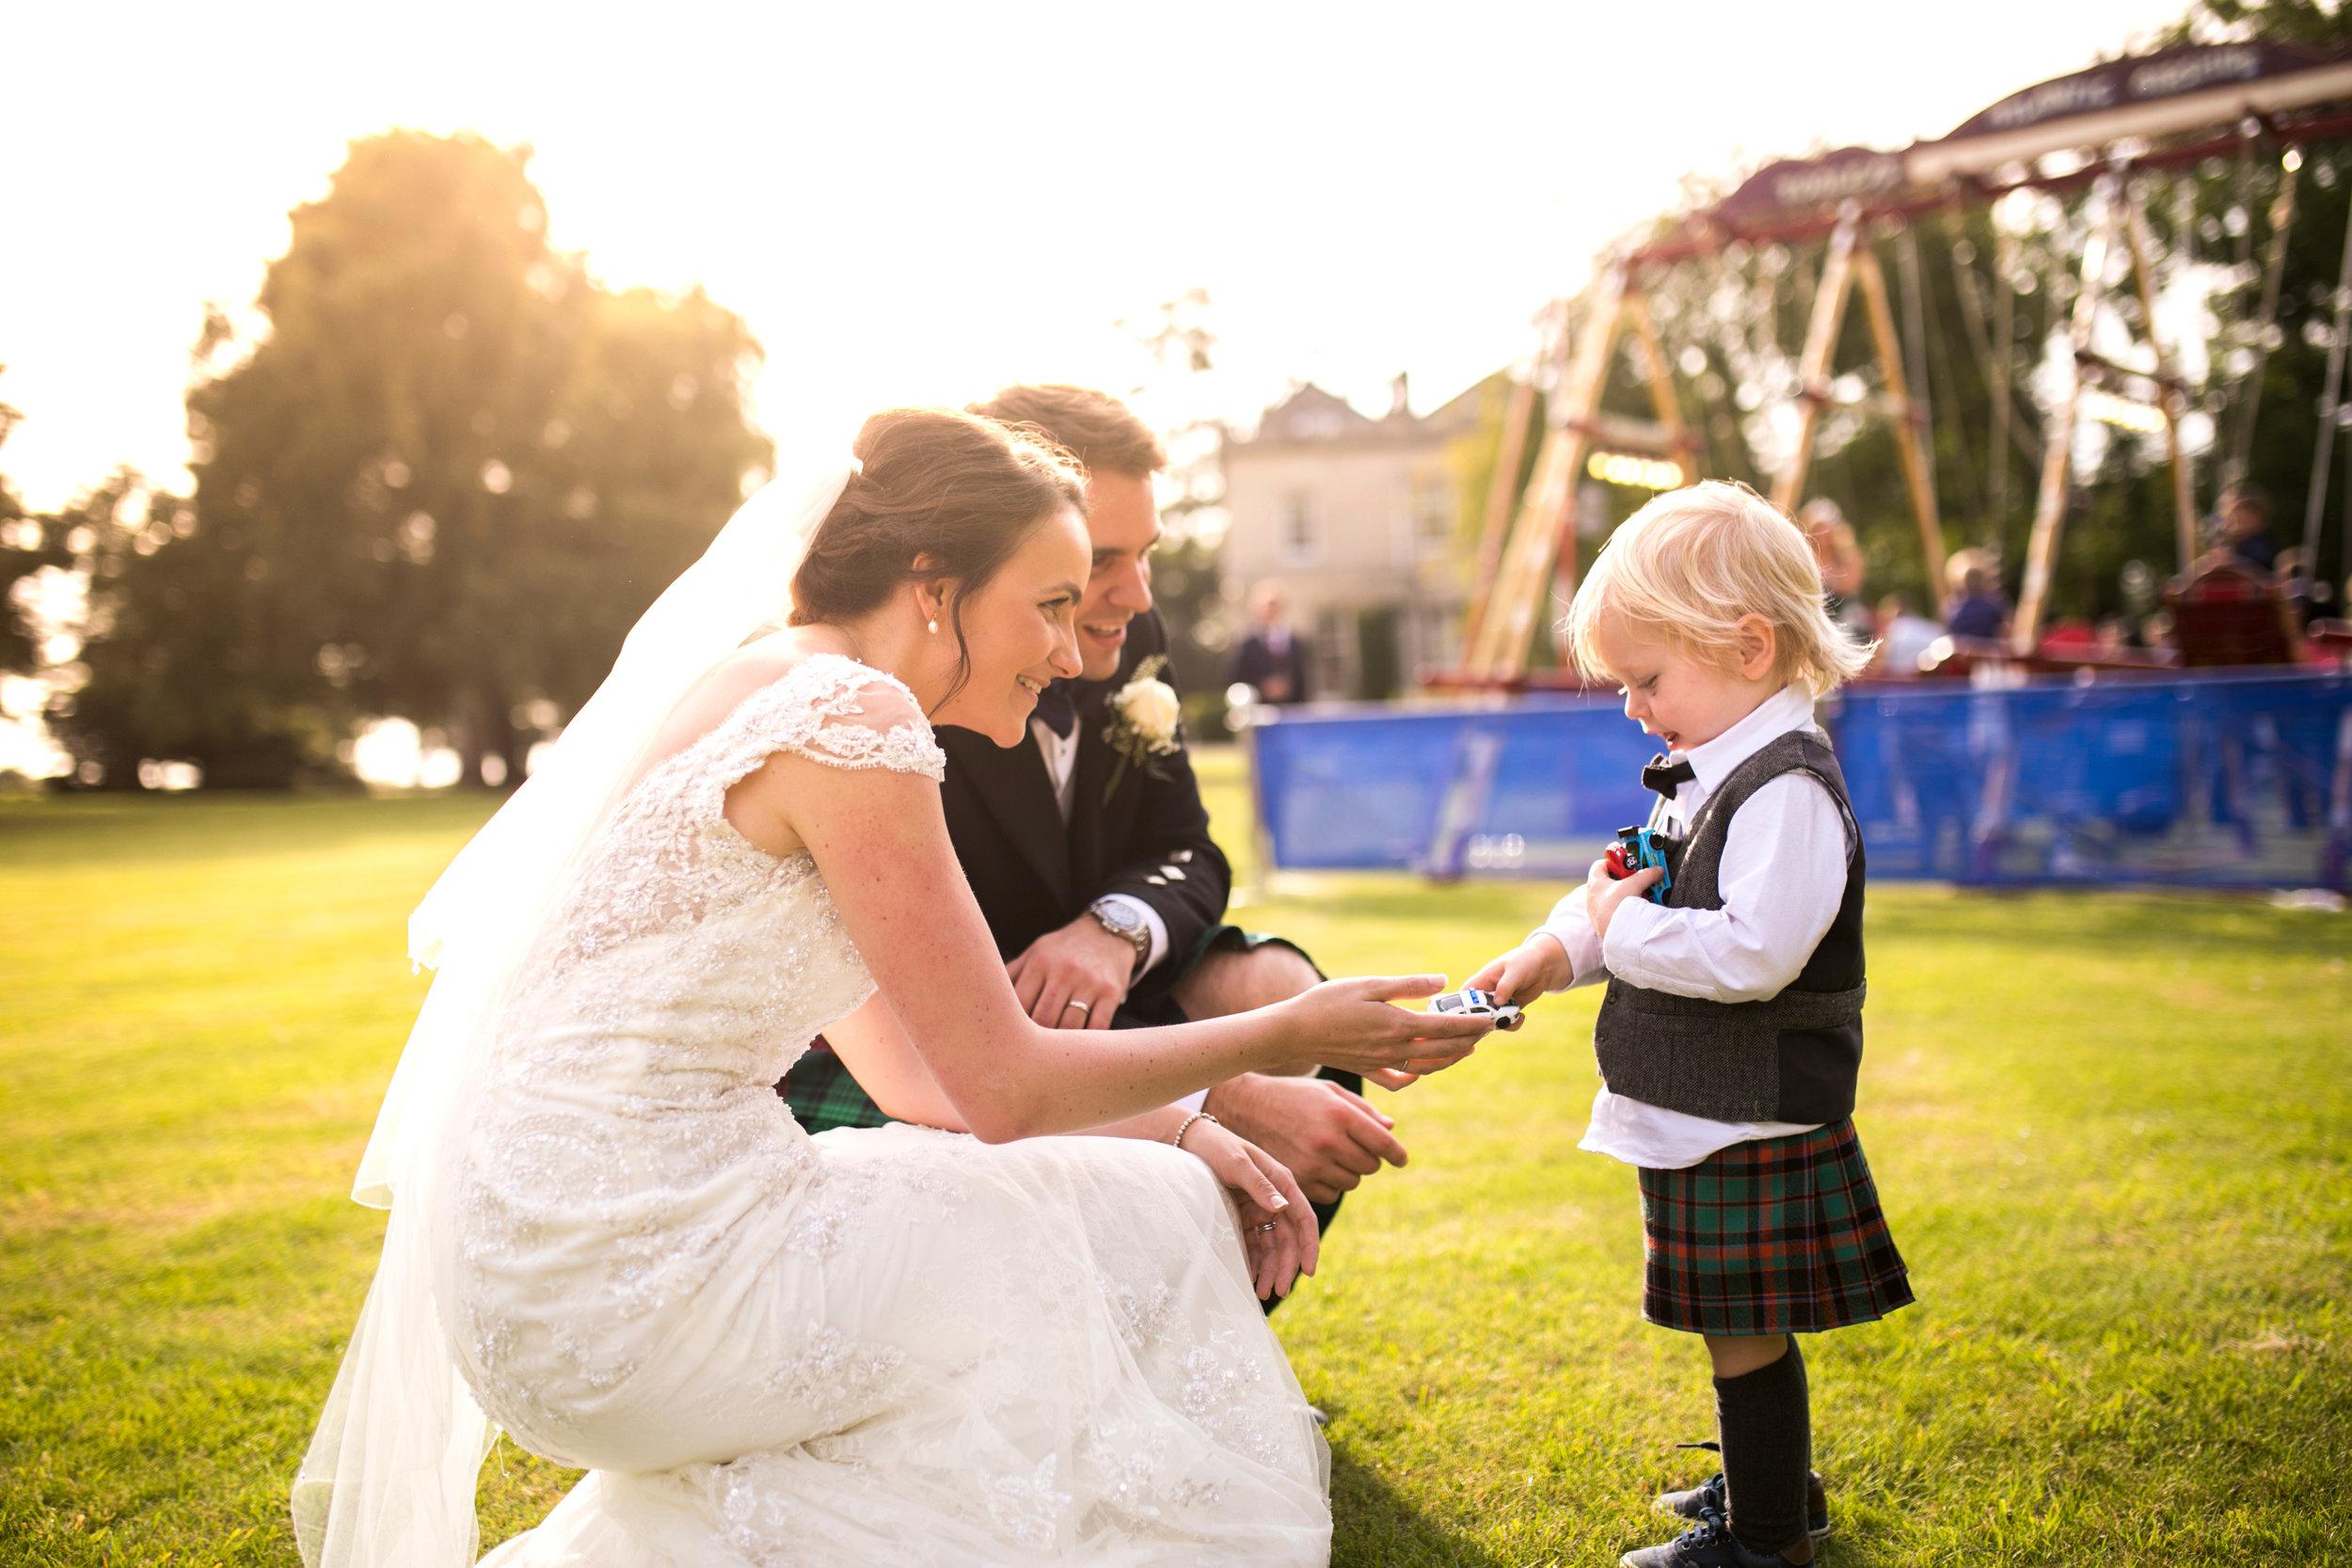 Sunset Wedding, Couple, page boy